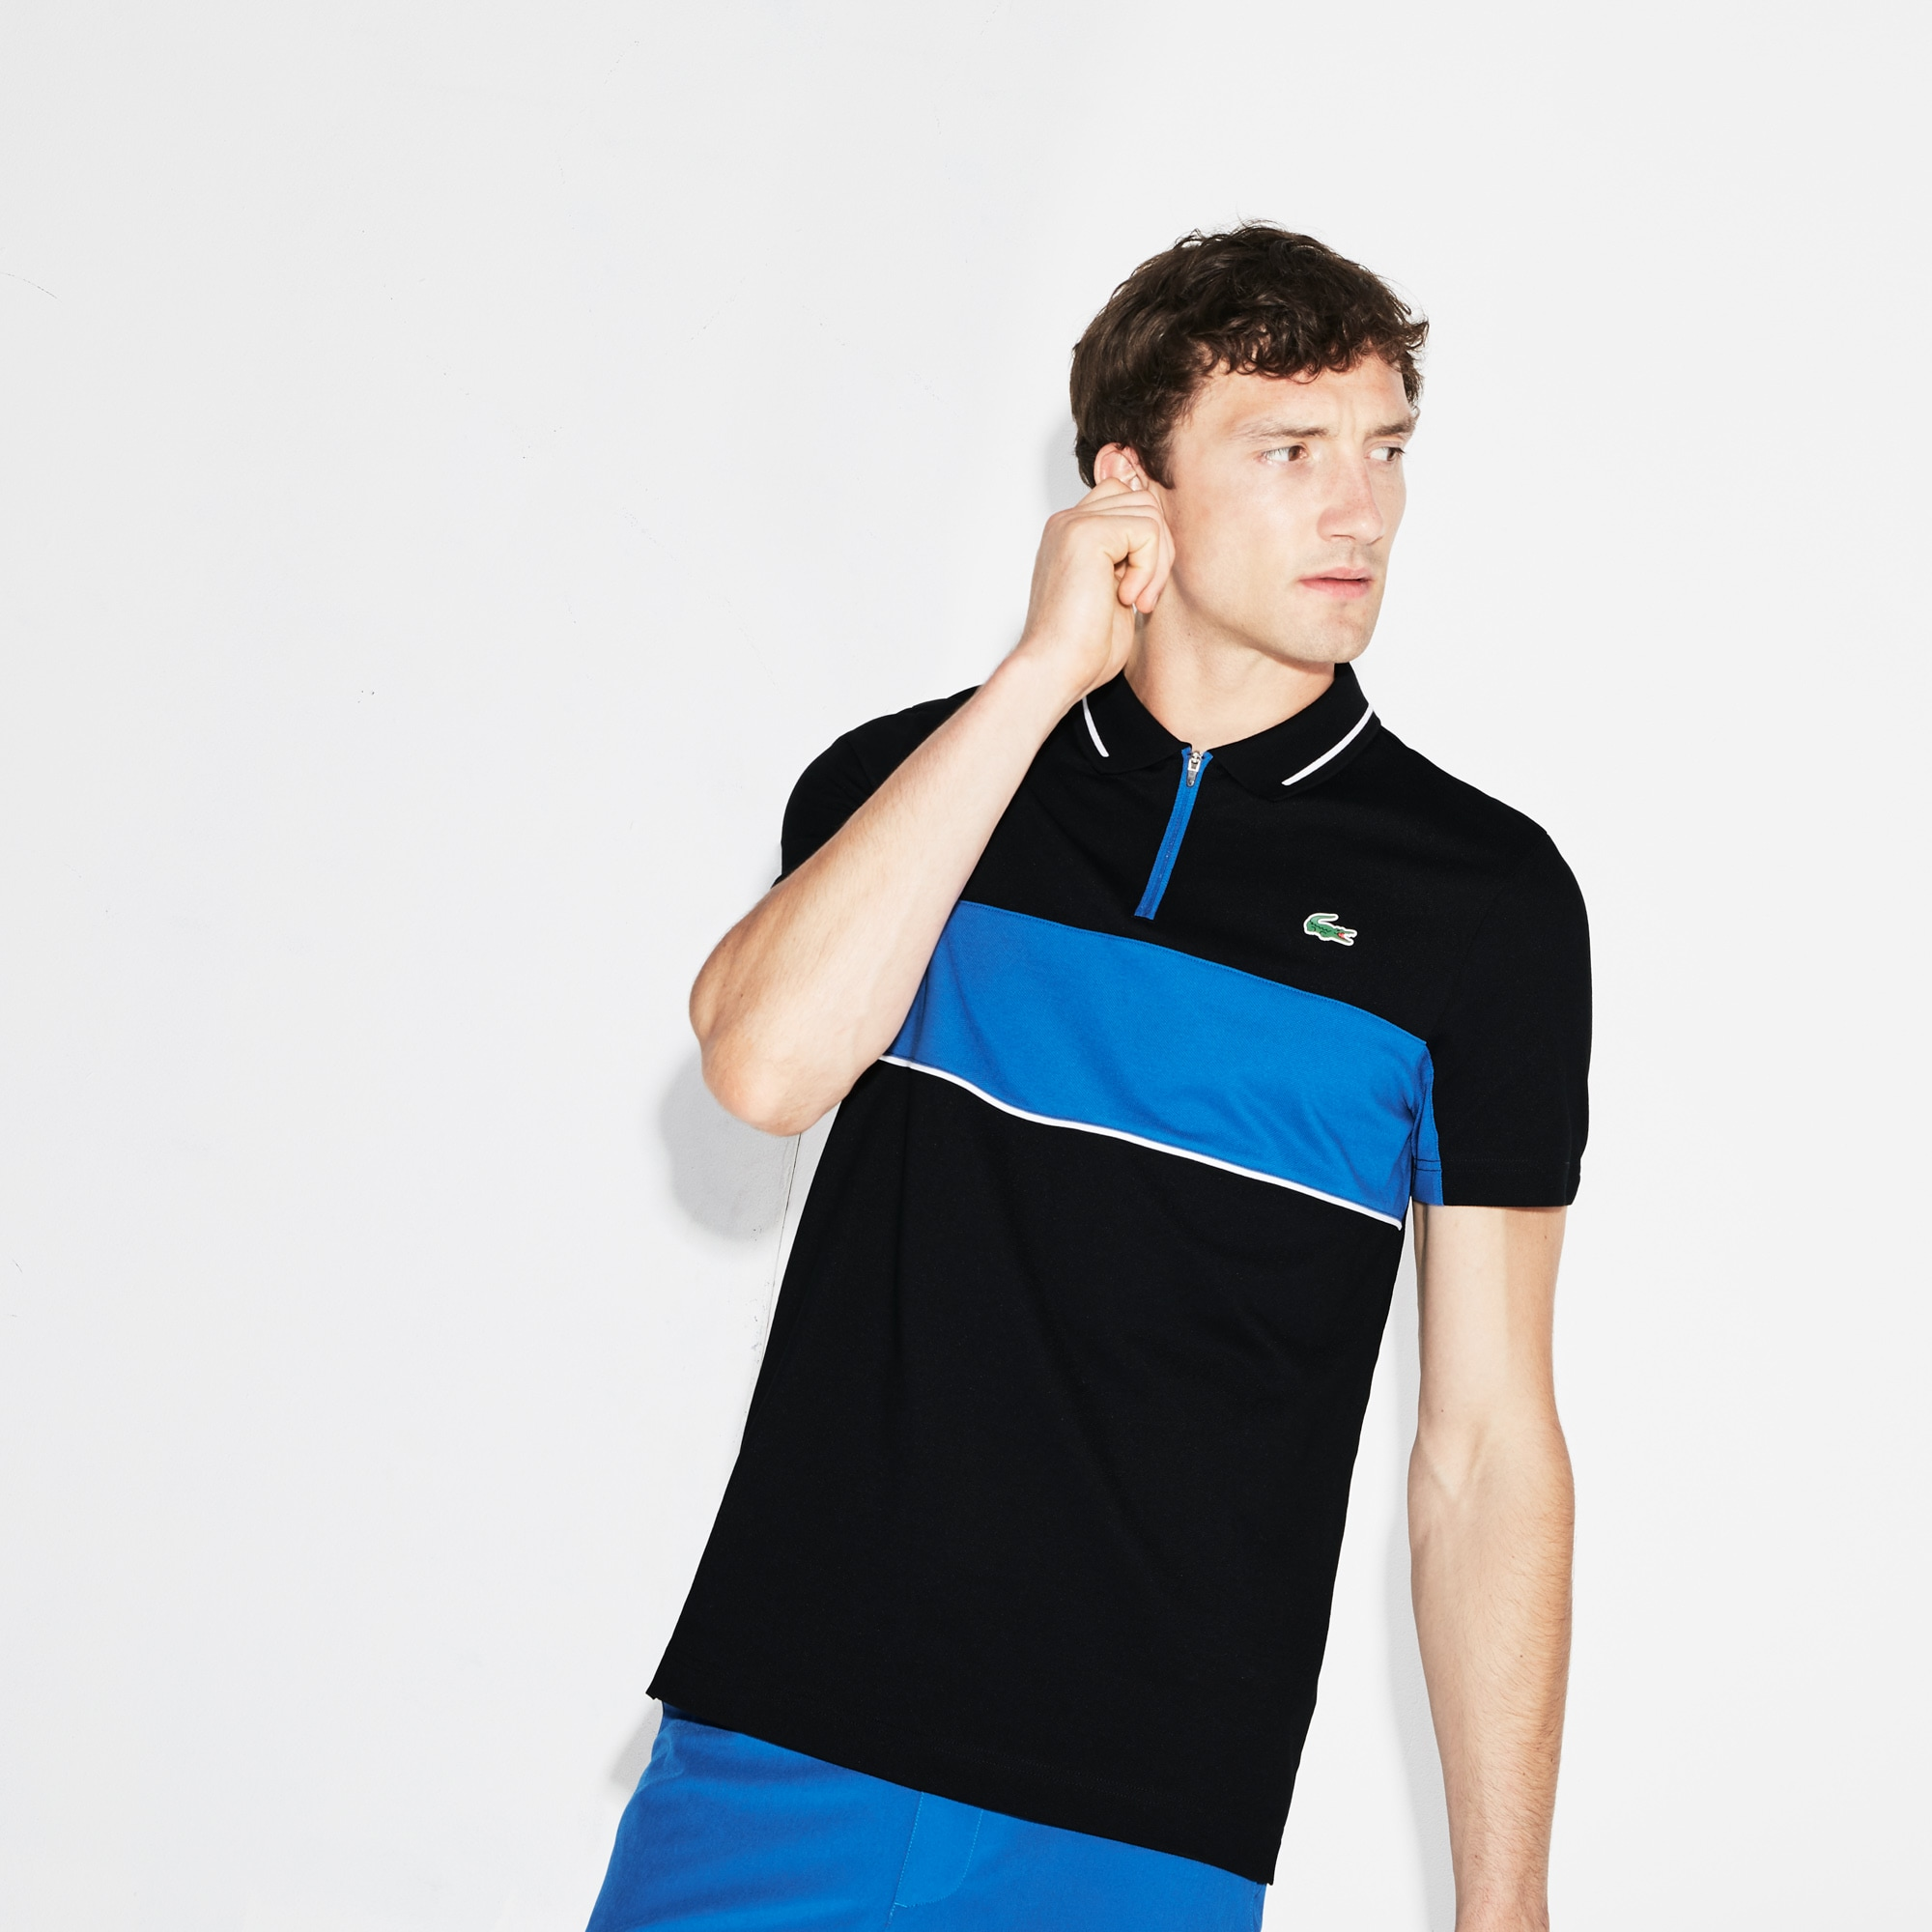 Lacoste - Herren LACOSTE SPORT Tennis-Poloshirt aus Funktionspiqué - 6